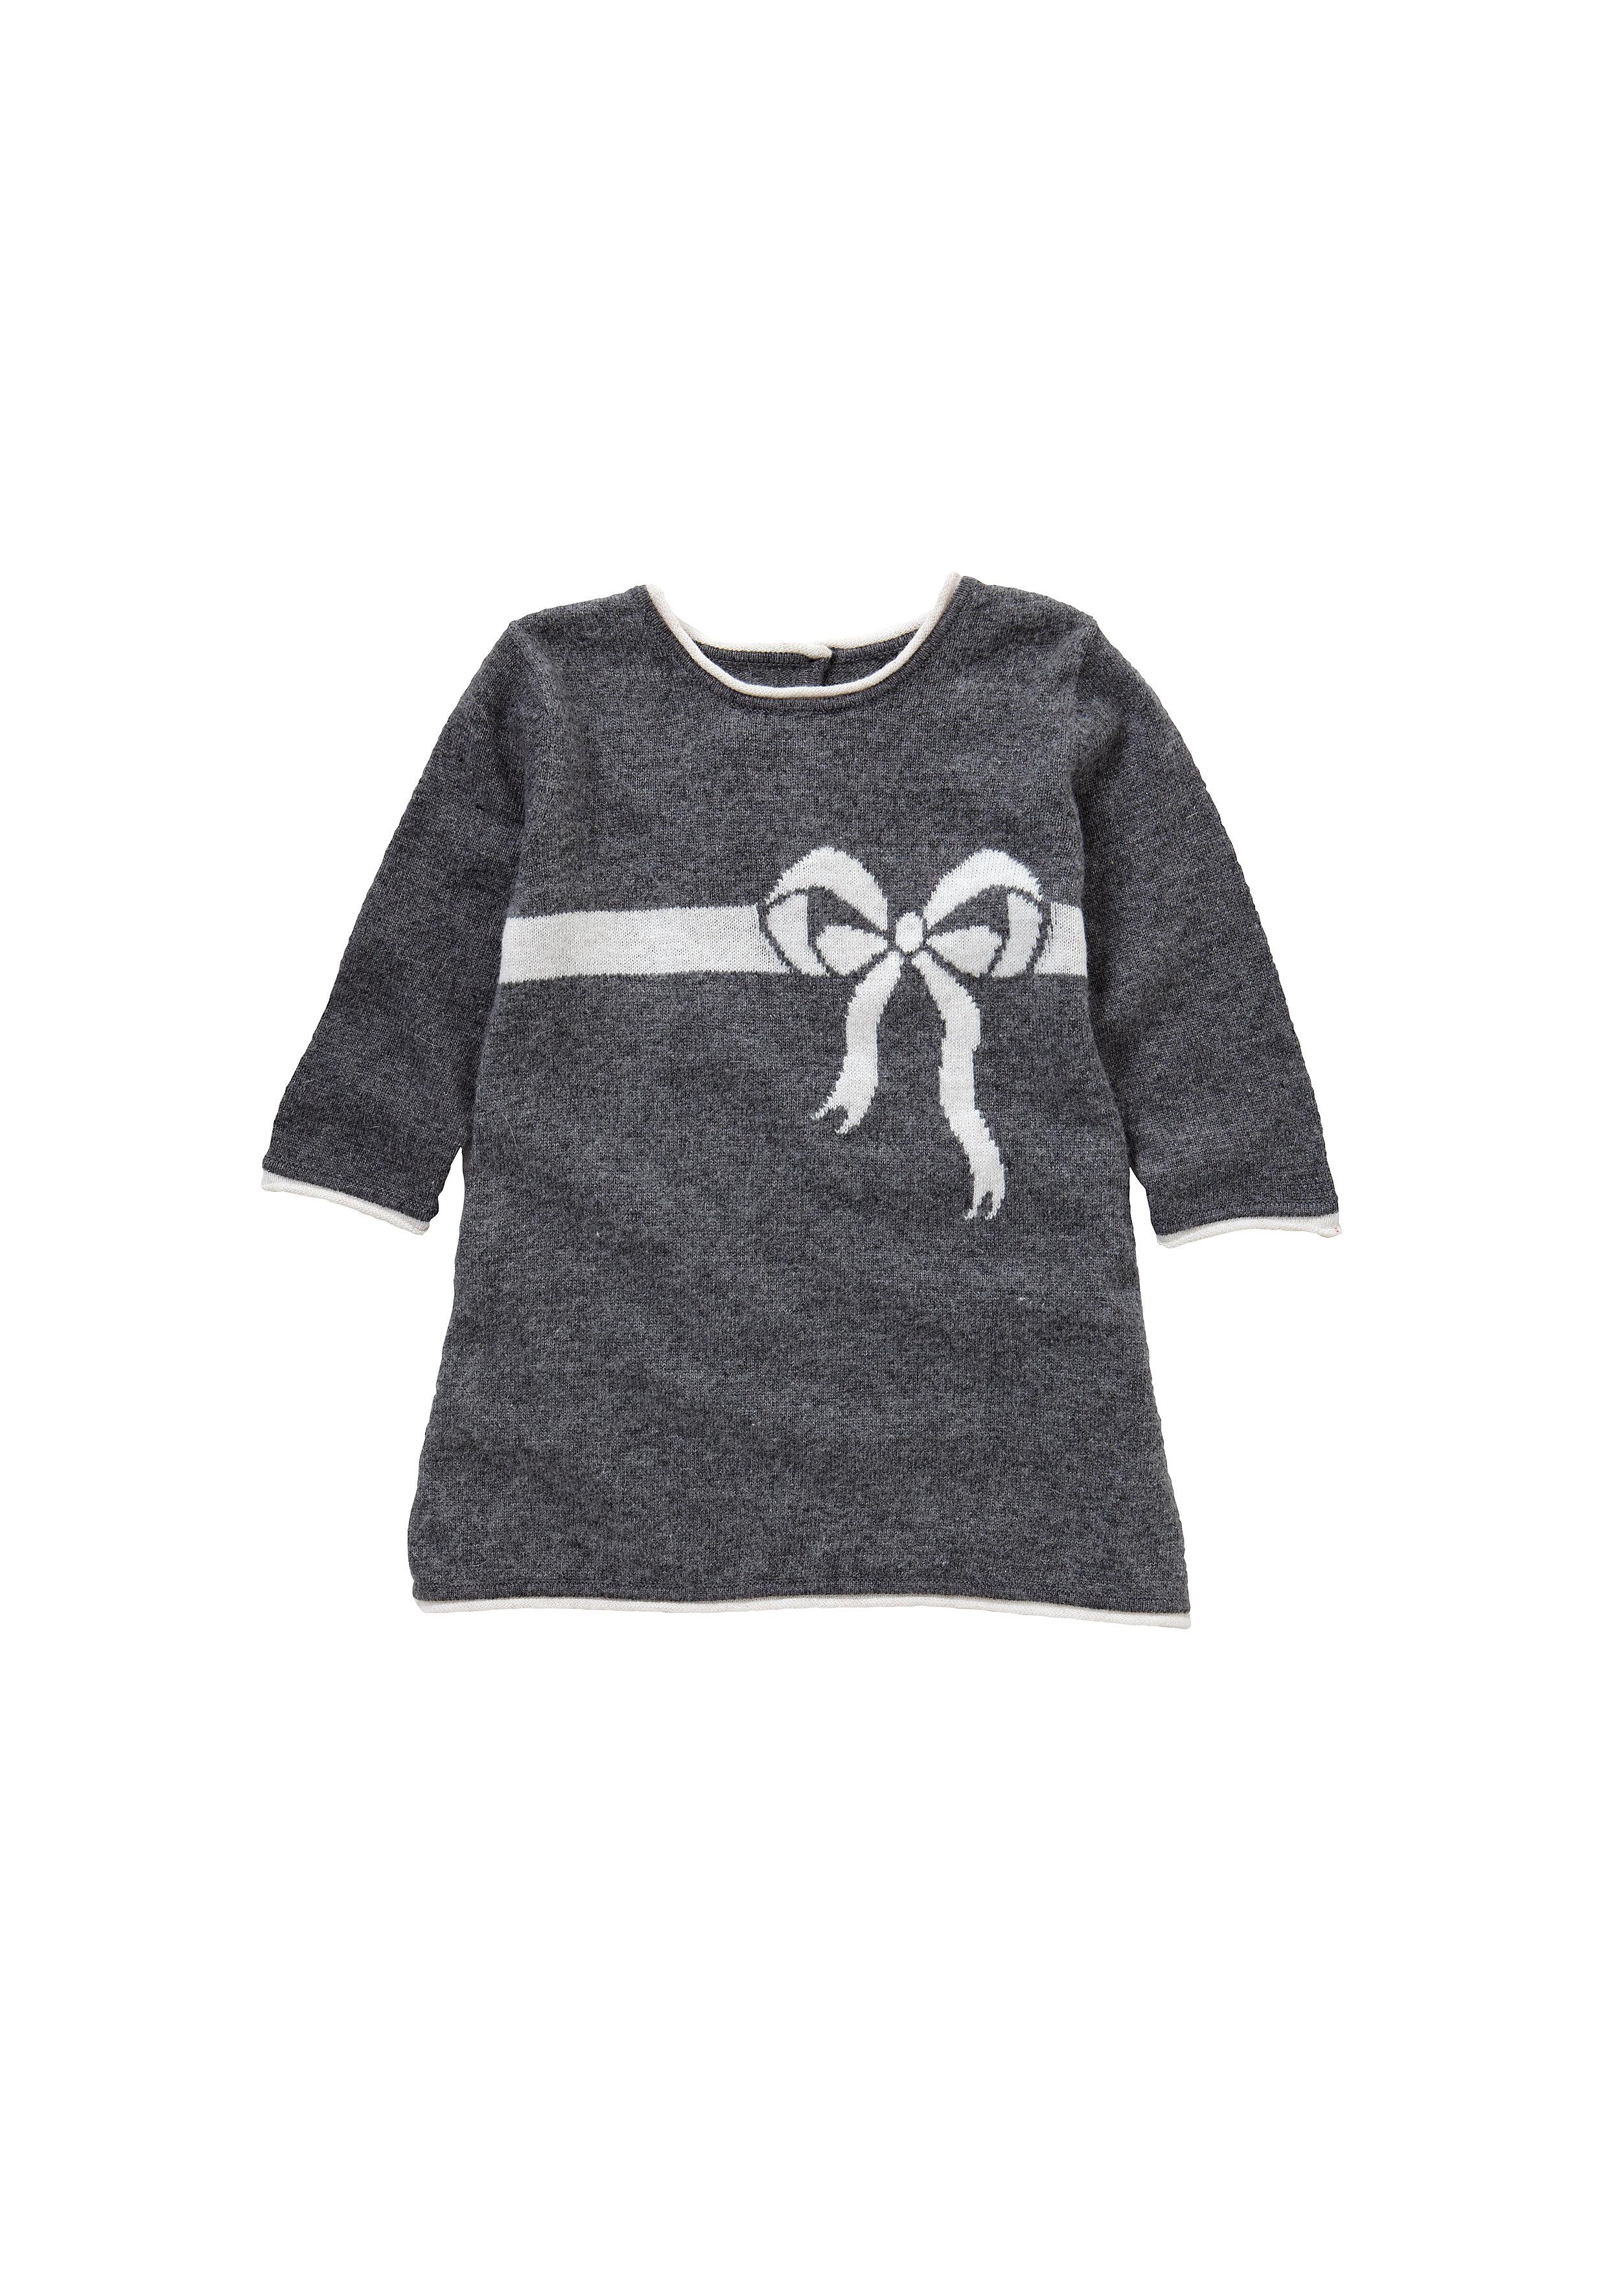 Mothercare | Girls Bow Intarsia Dress - Grey